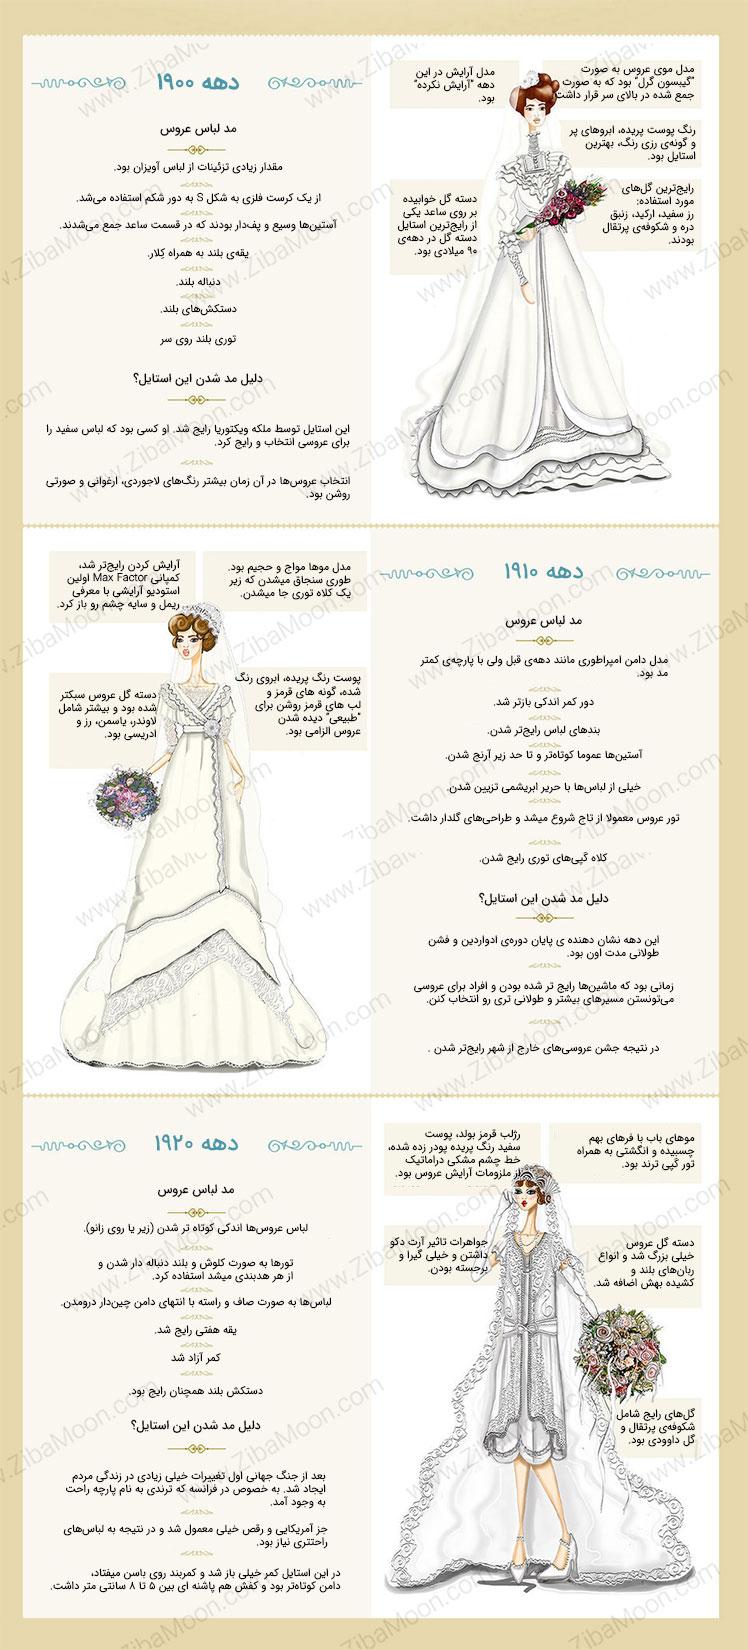 لباس عروس دهه 1900 تا 1920